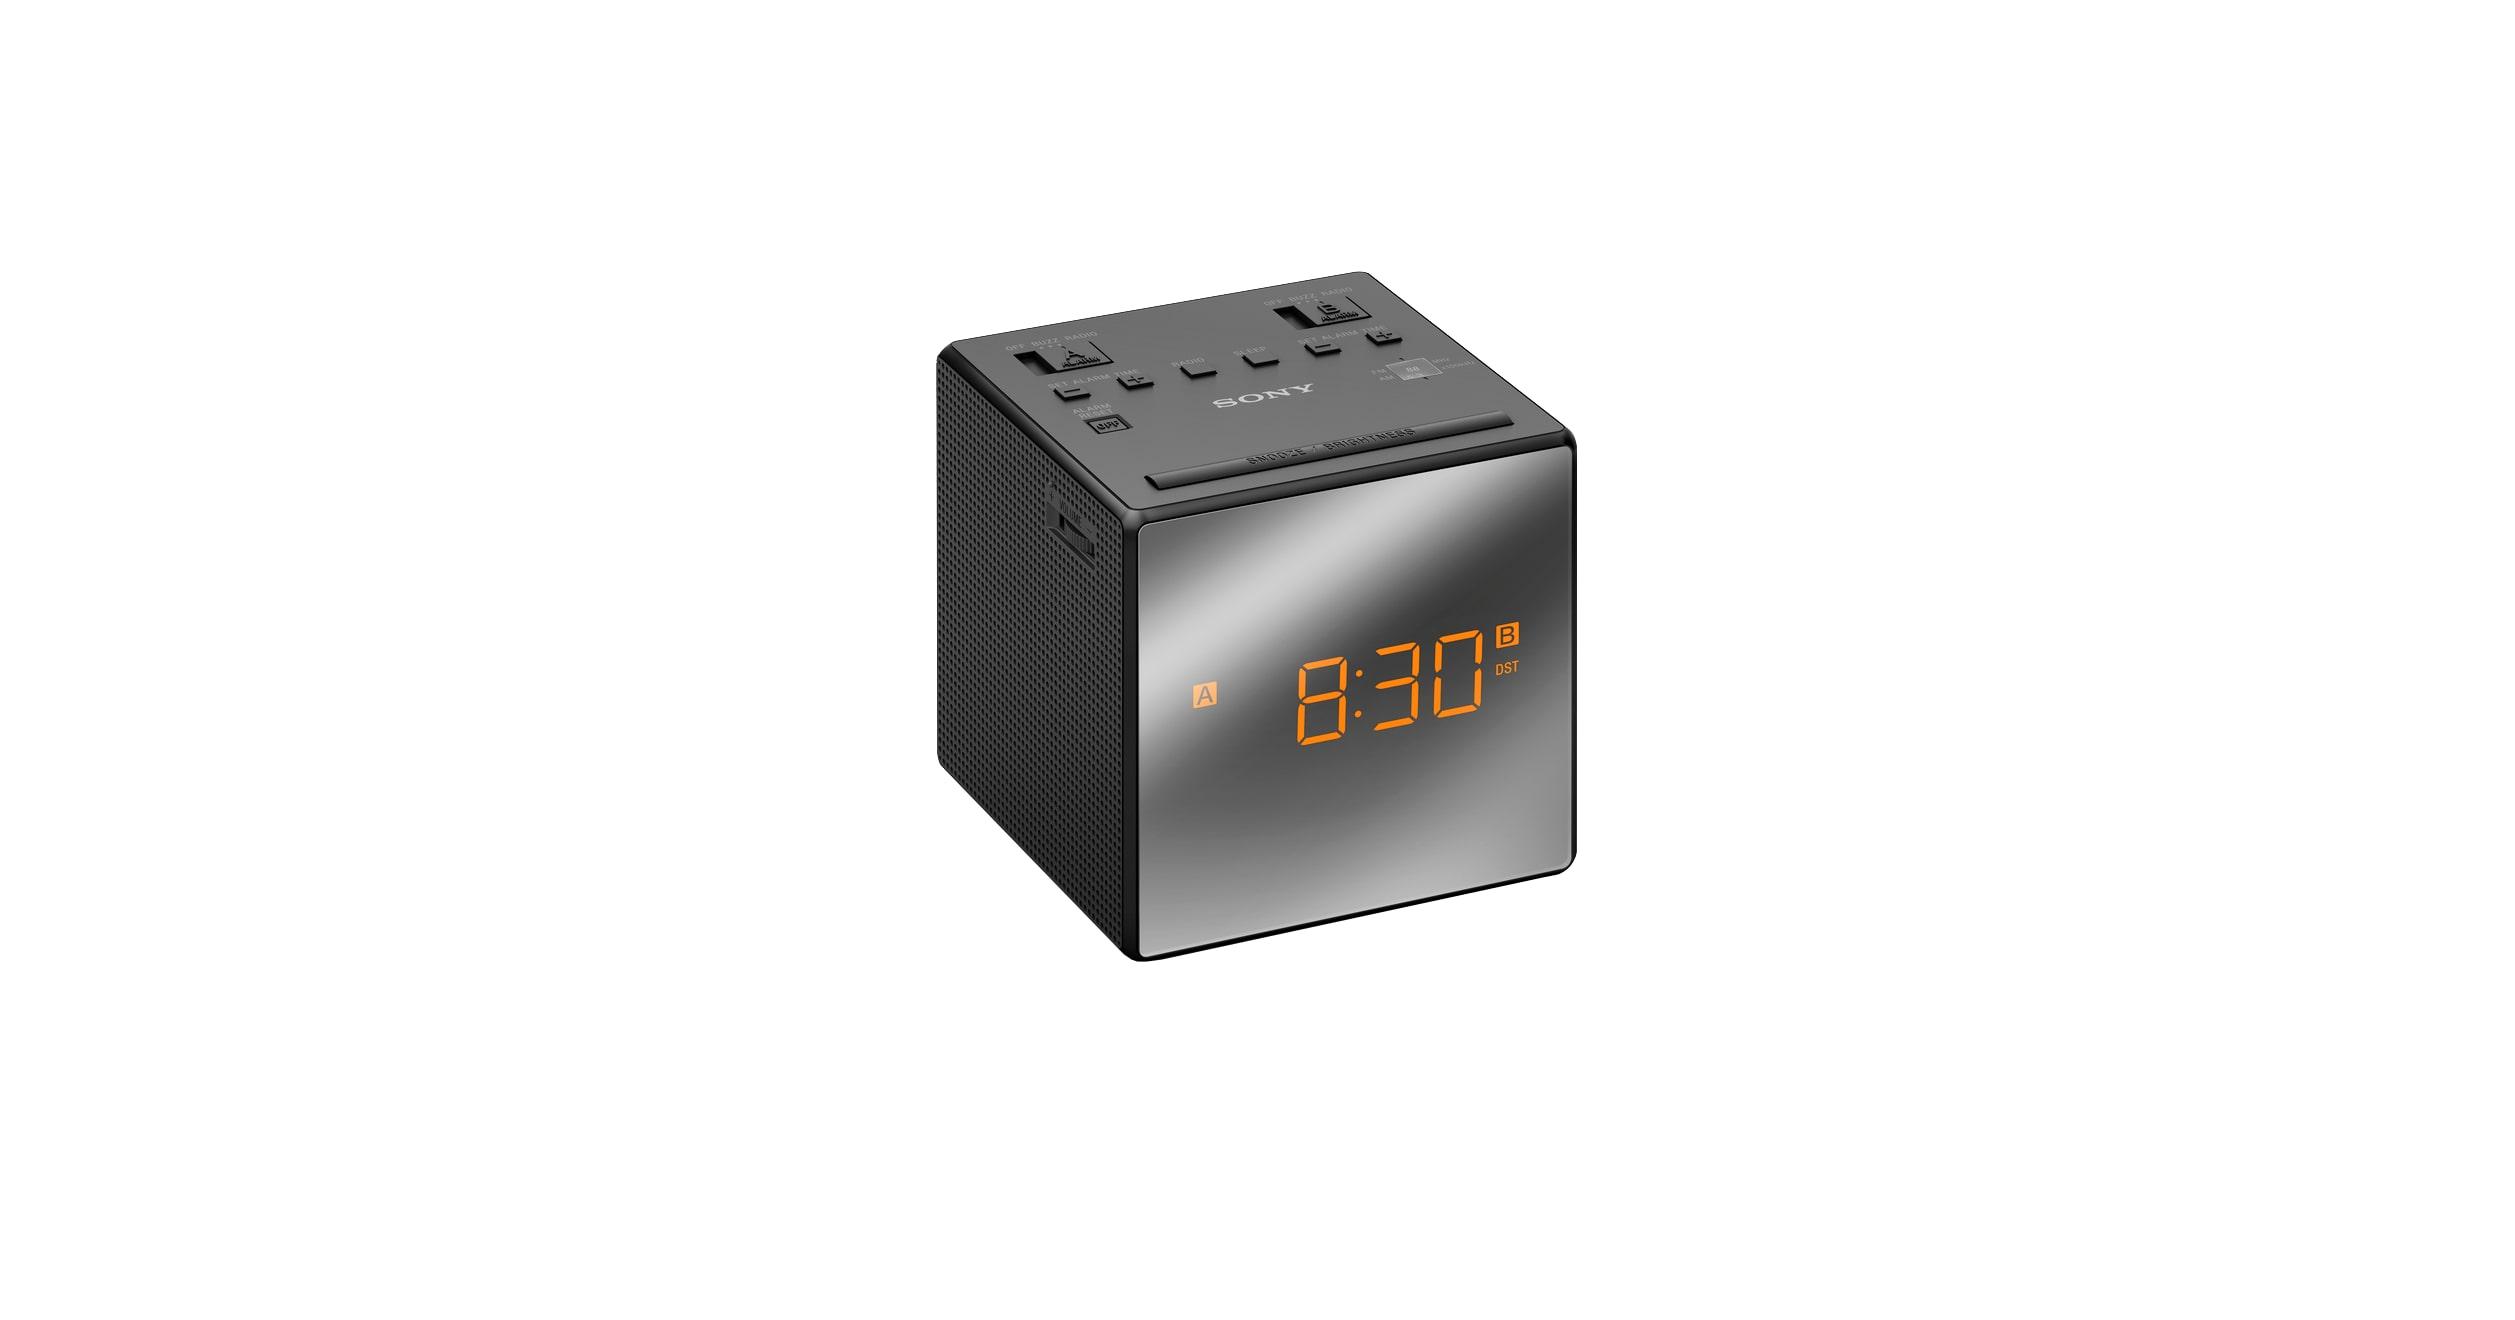 Clock Radio Icf C1t Sony Ae